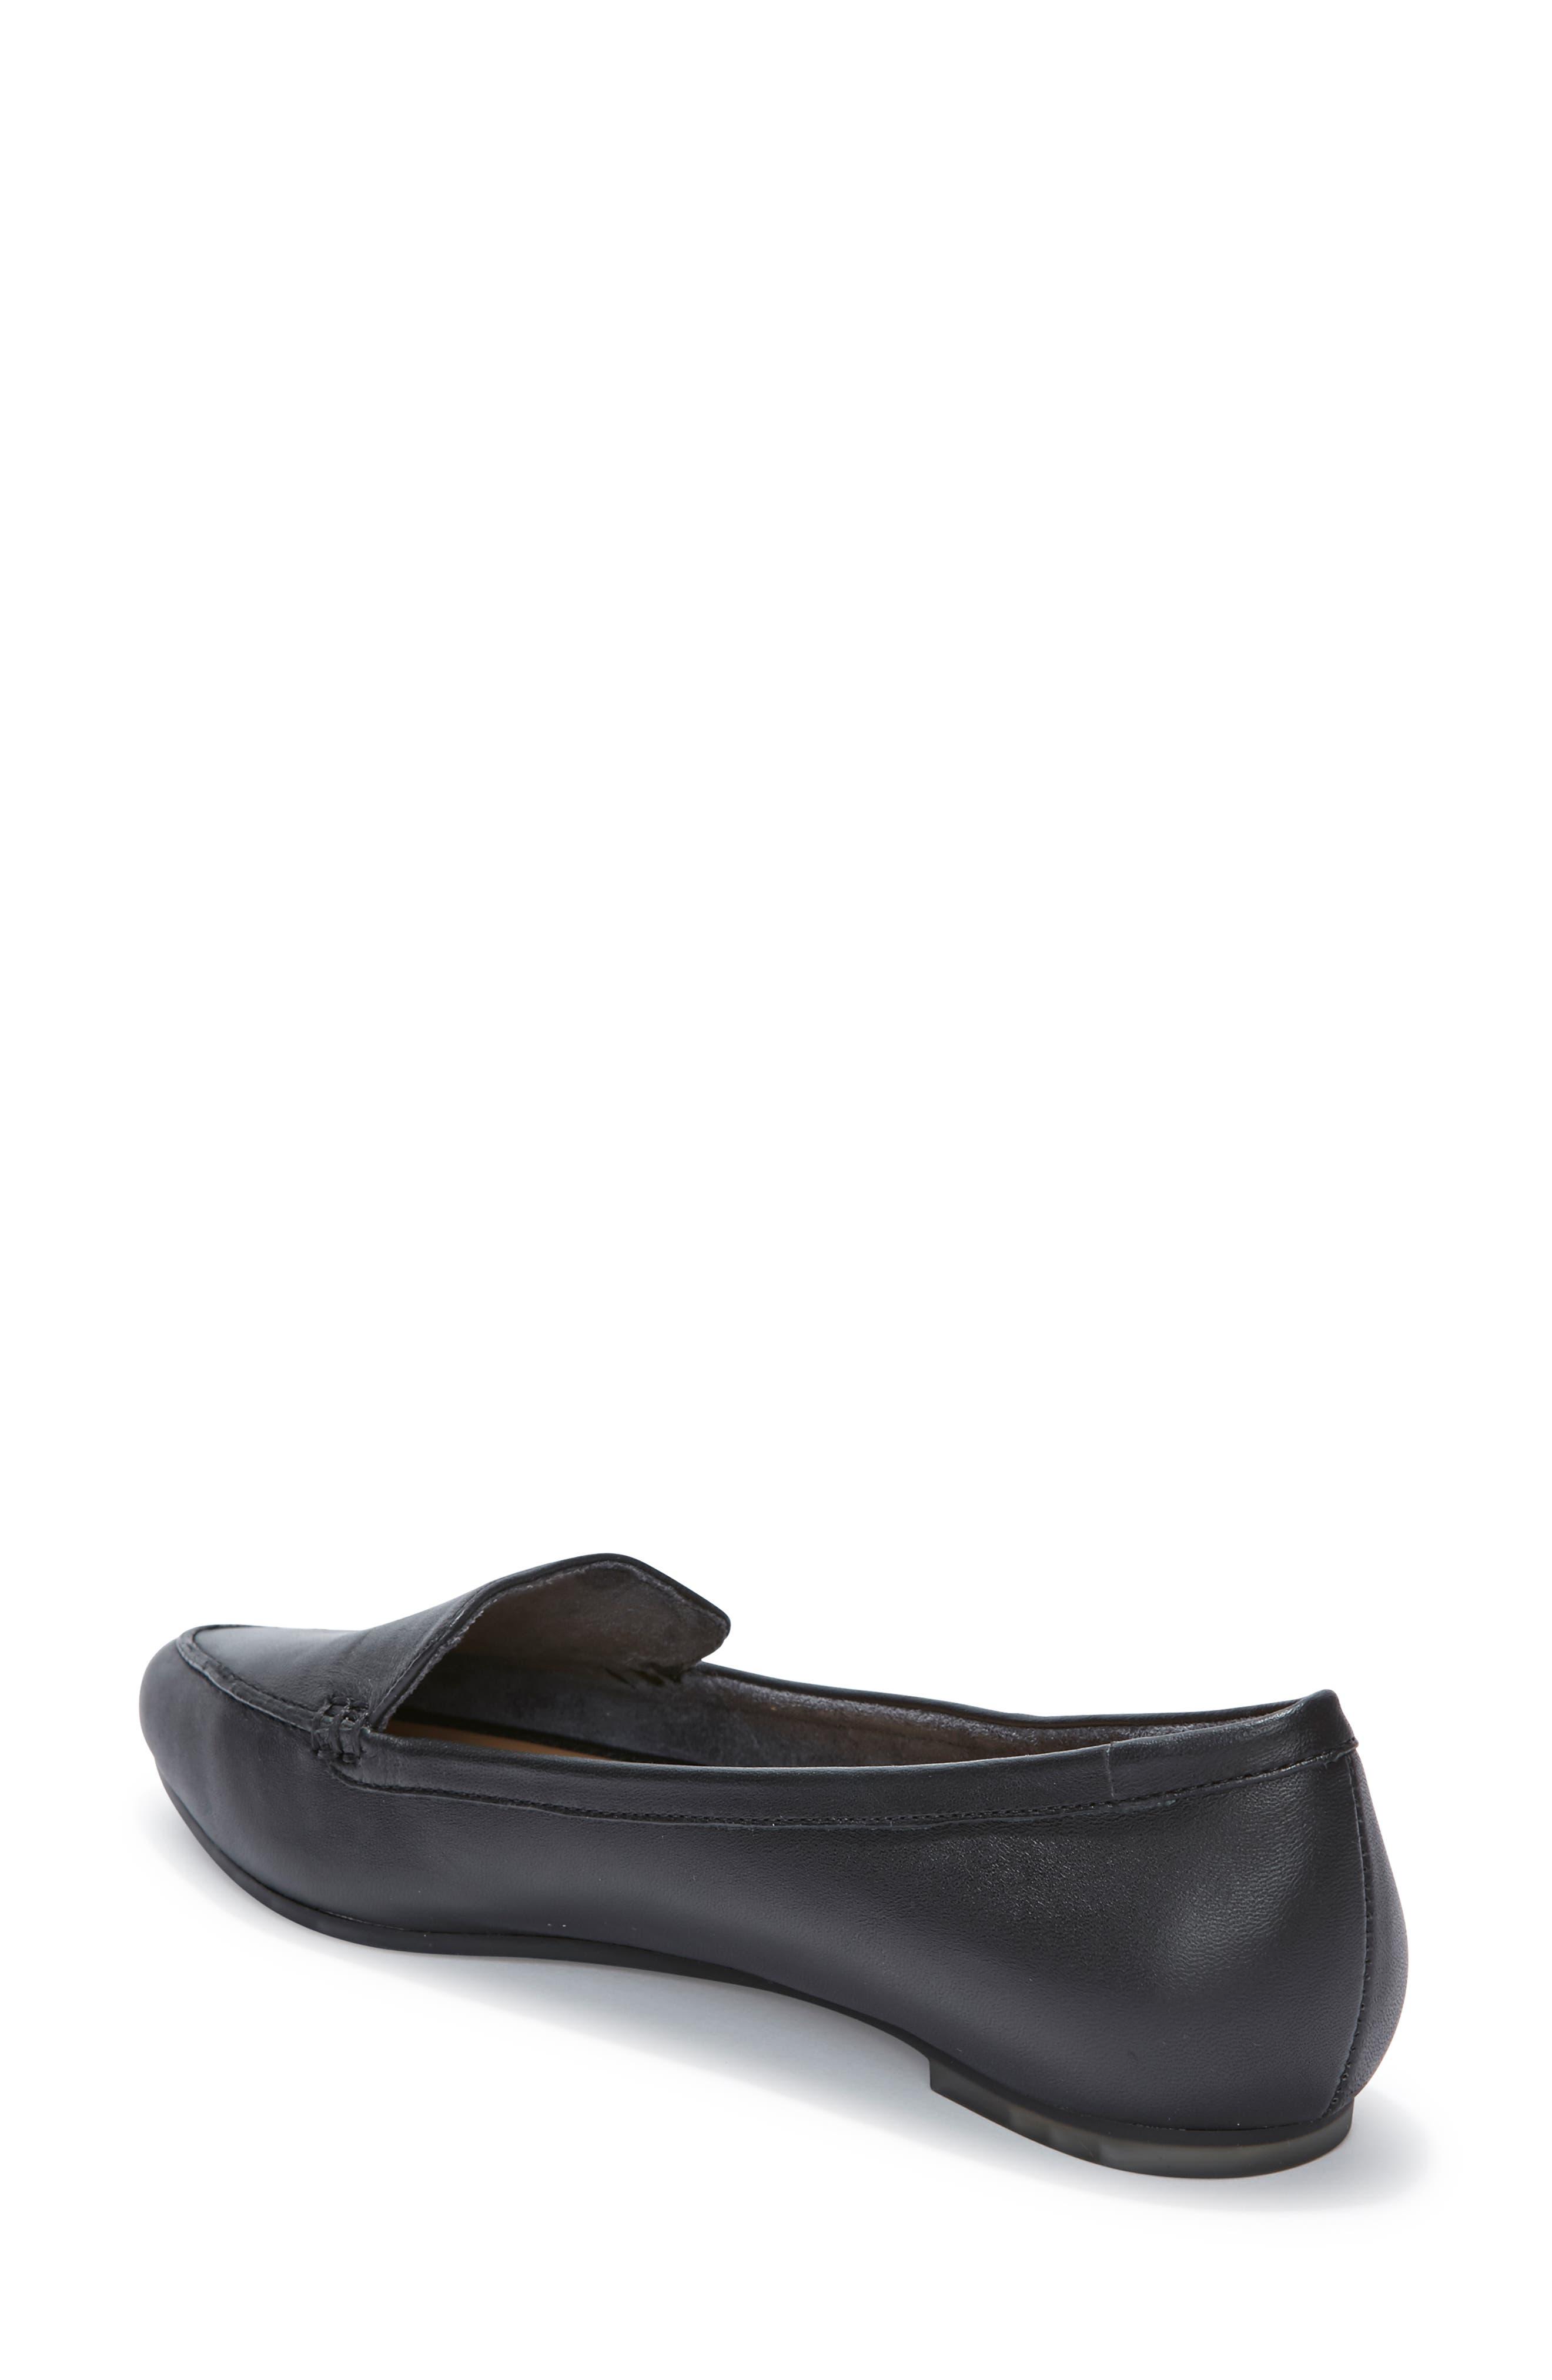 Audra Loafer Flat,                             Alternate thumbnail 2, color,                             BLACK/ BLACK LEATHER